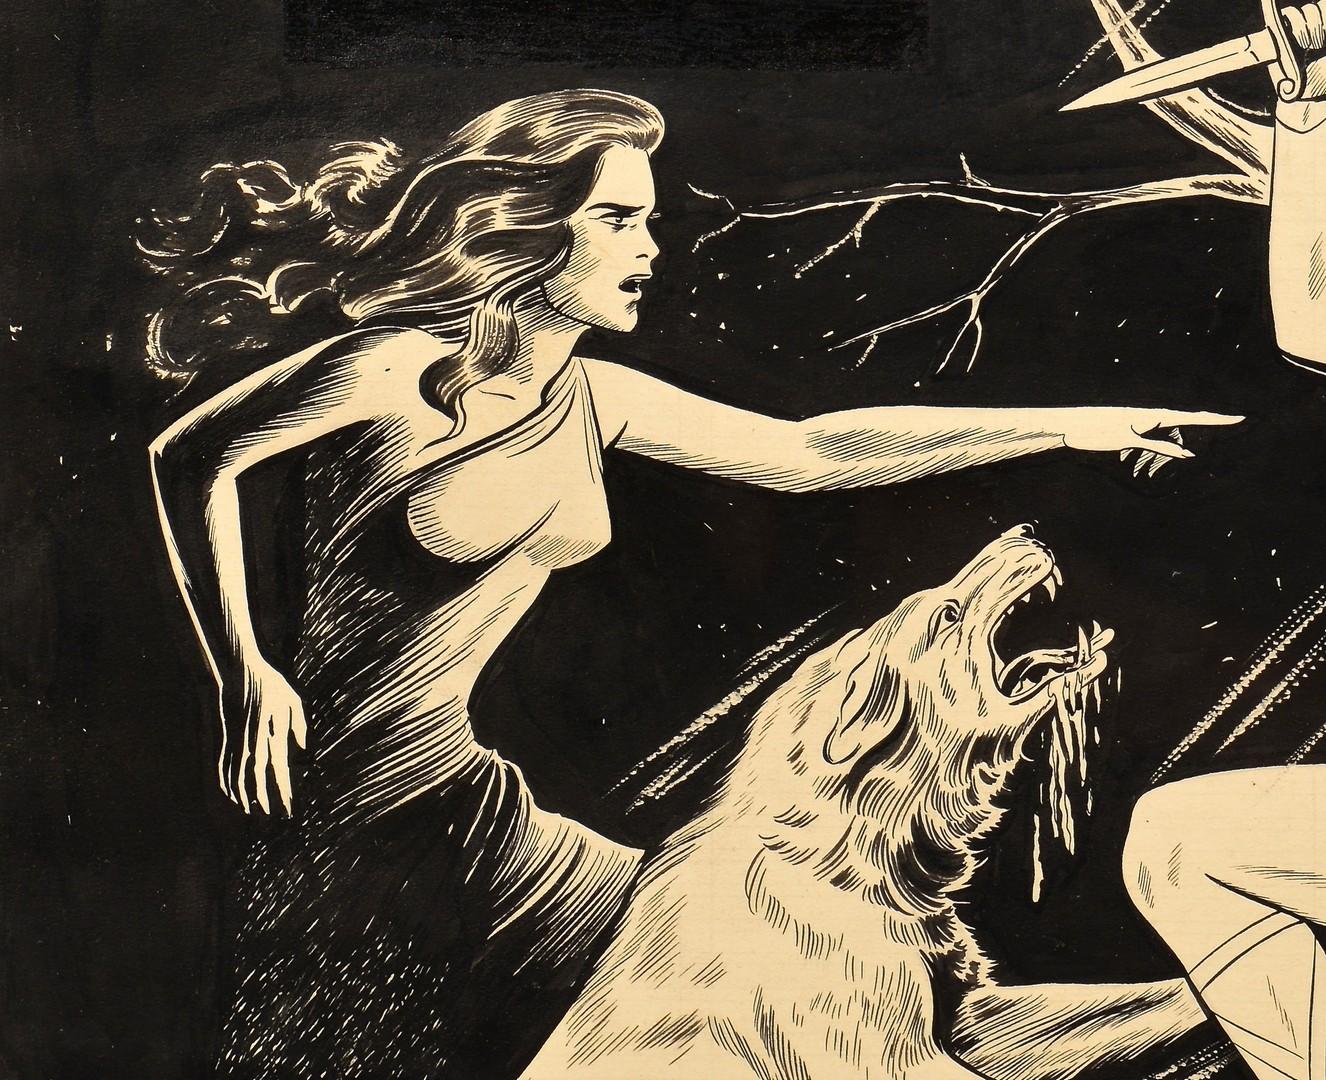 Lot 439: Sheldon Moldoff Moon Girl #7 Cover Art